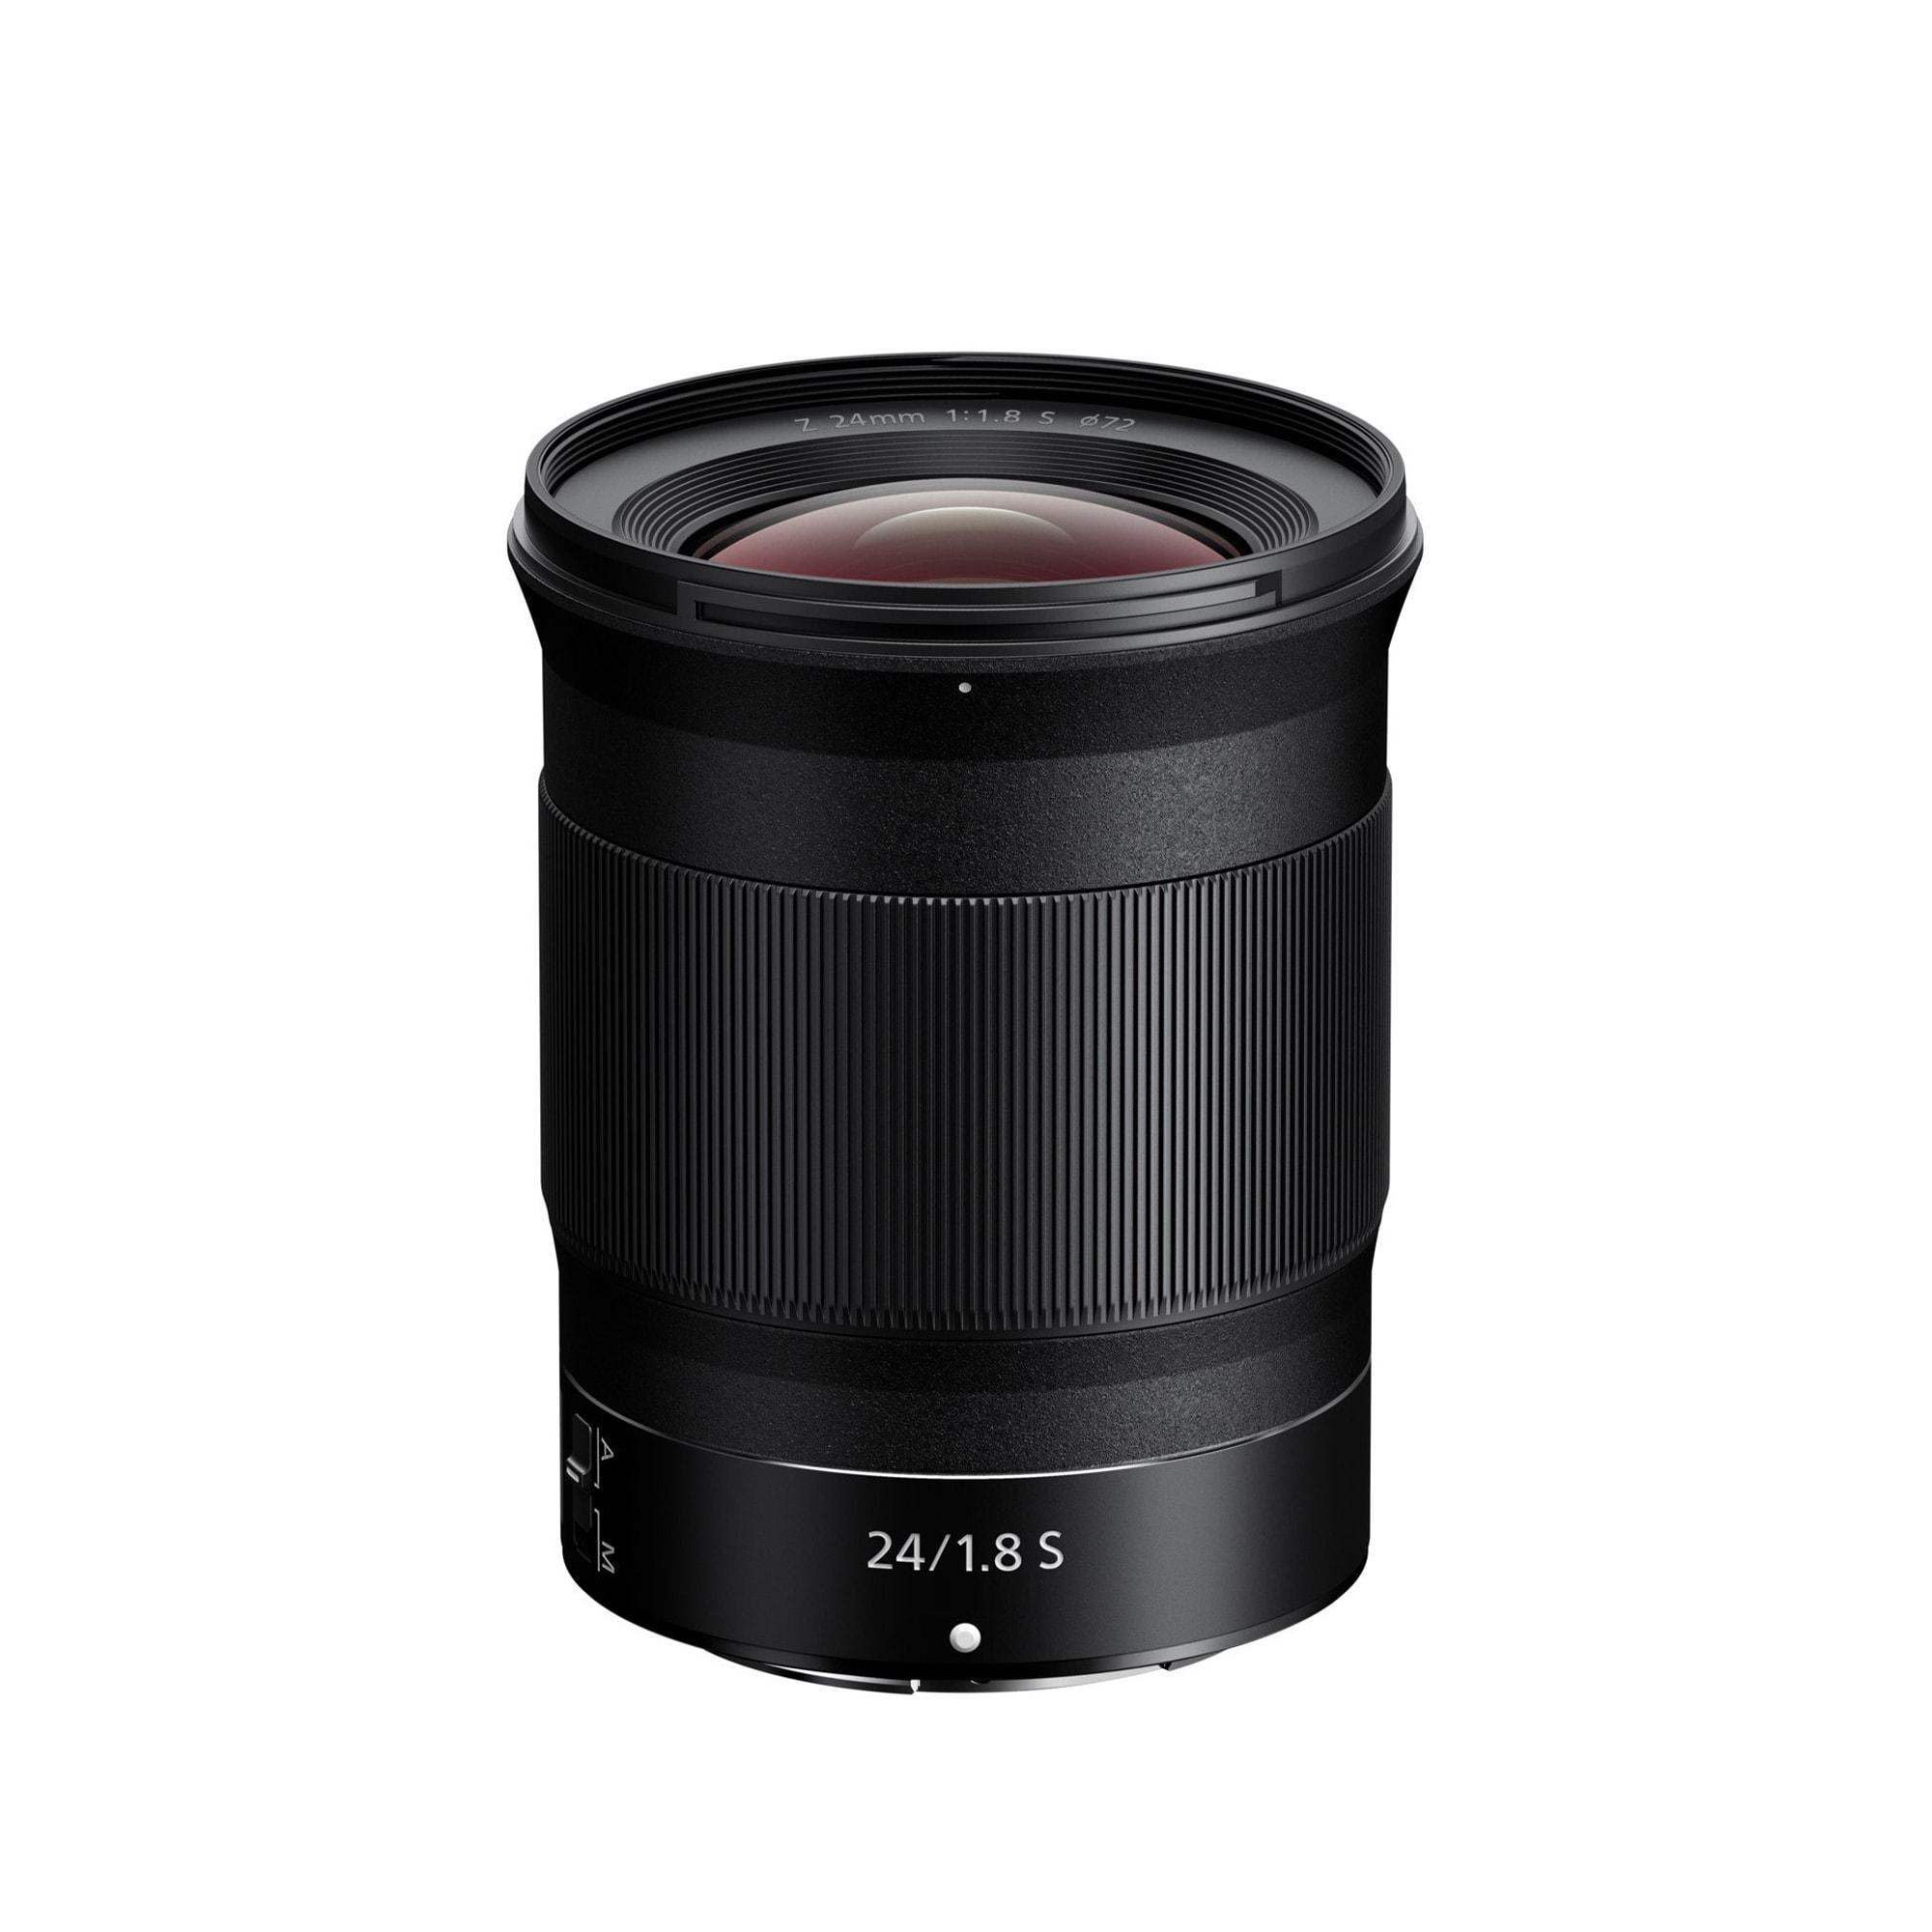 Nikon-z-24mm-f18-s-side